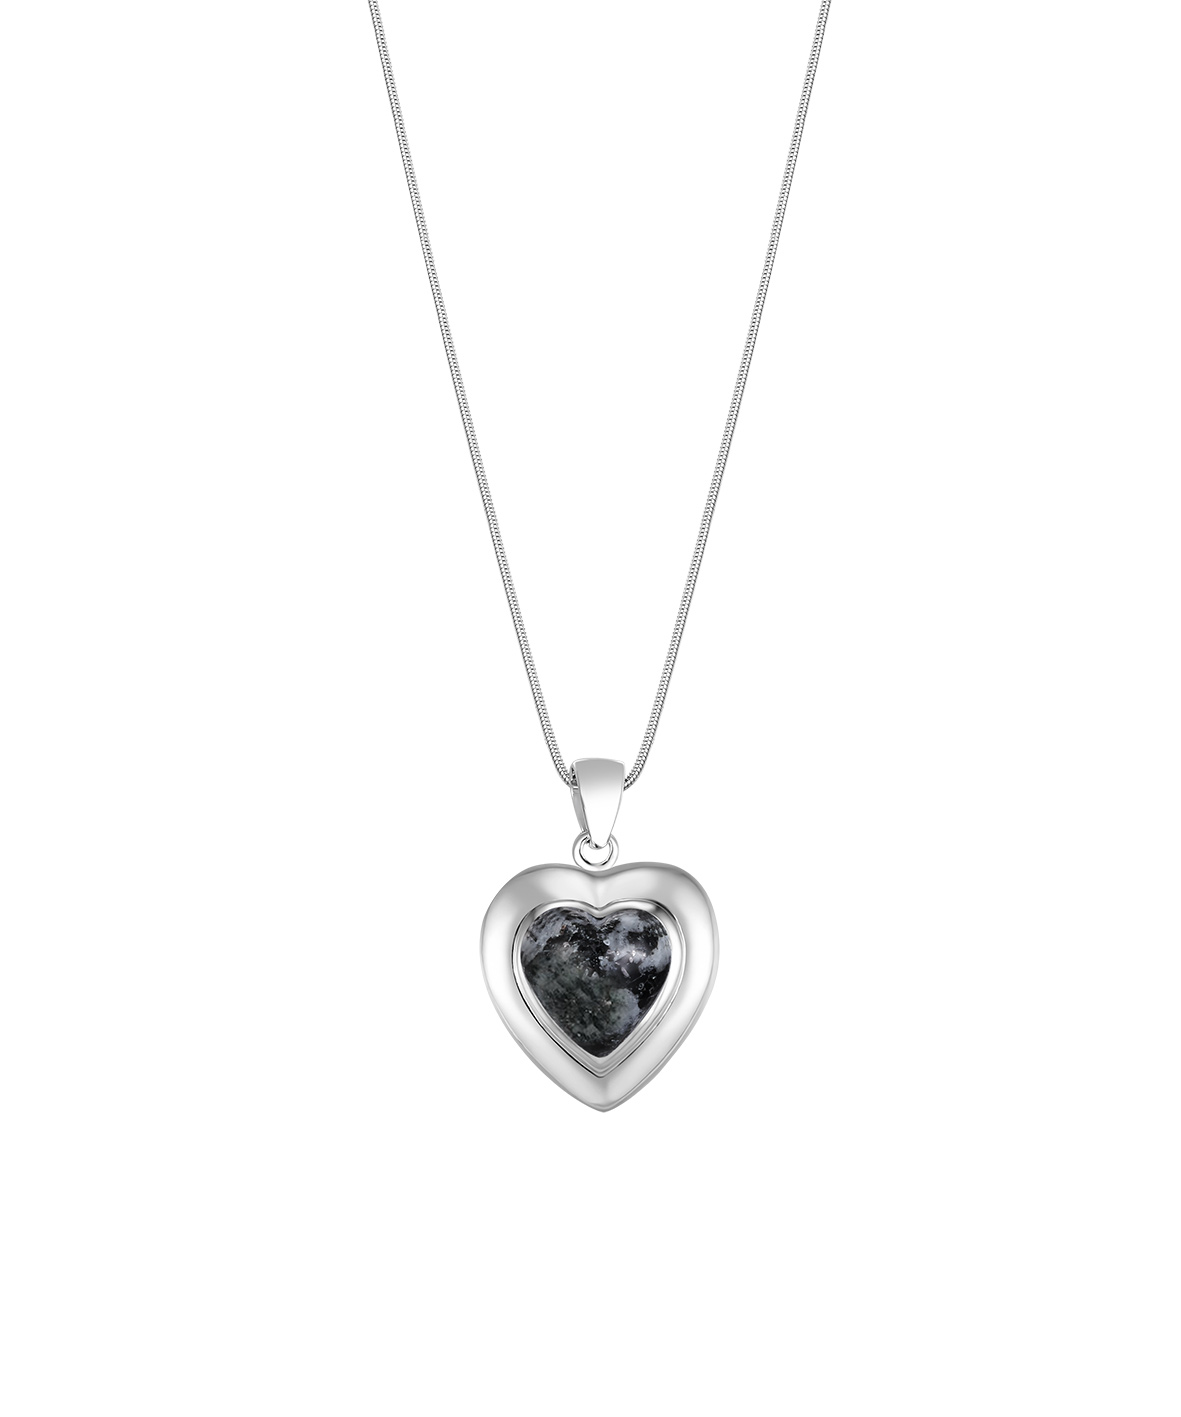 Madeira Heart Necklace